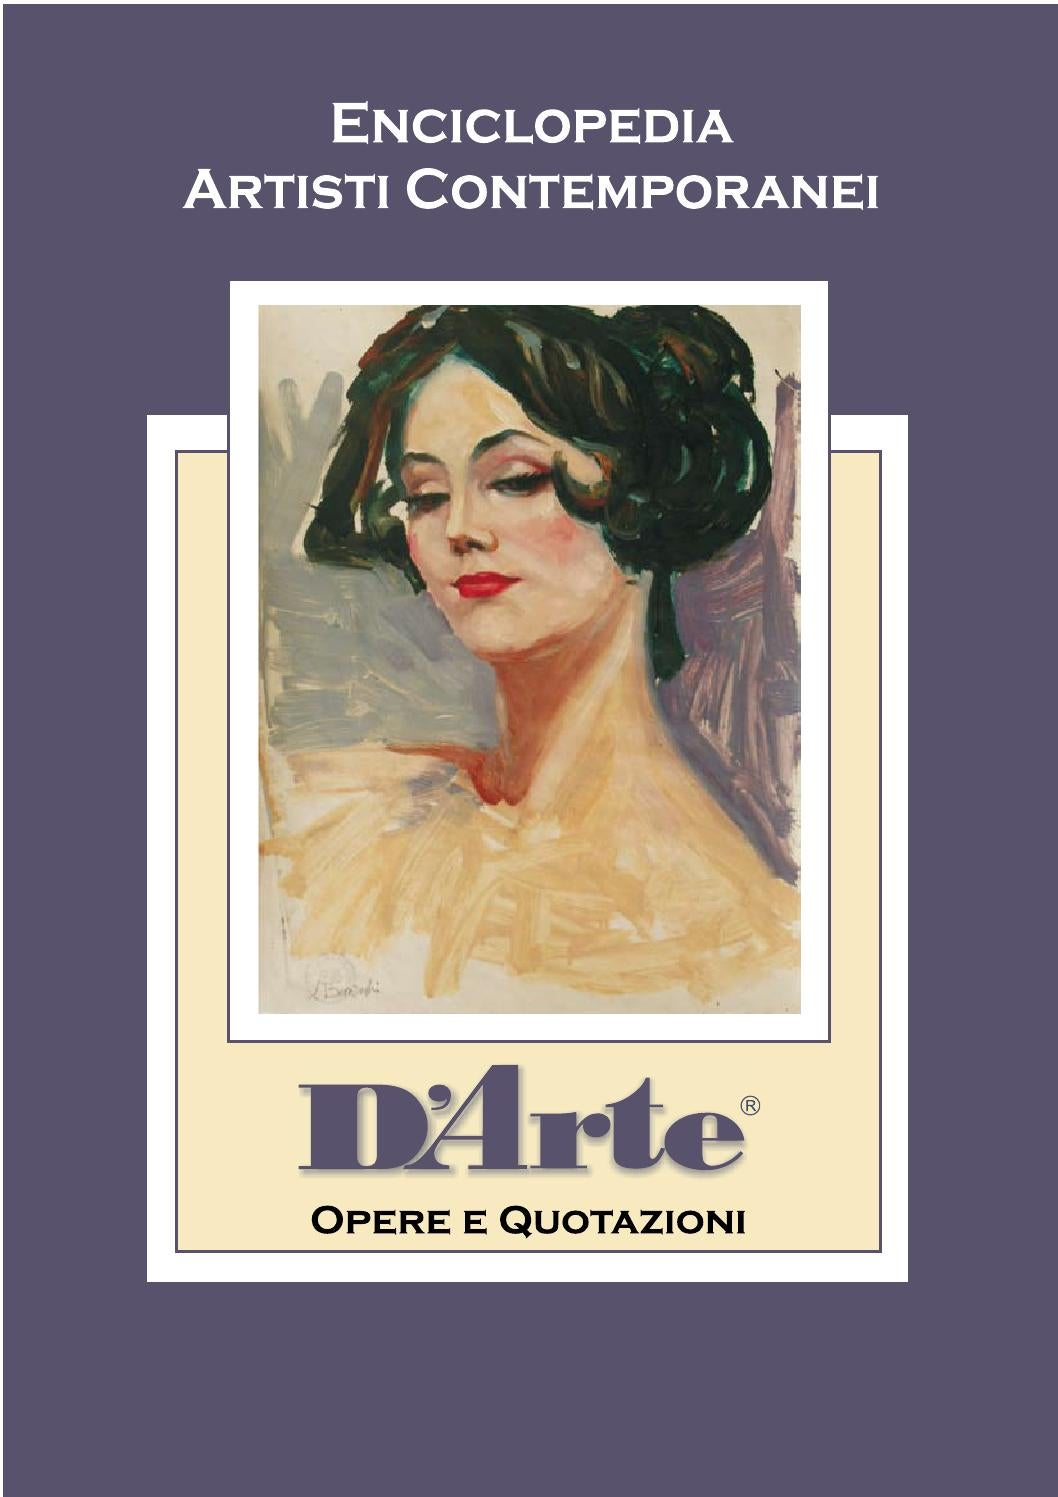 Enciclopedia D Arte By D ARTE Issuu